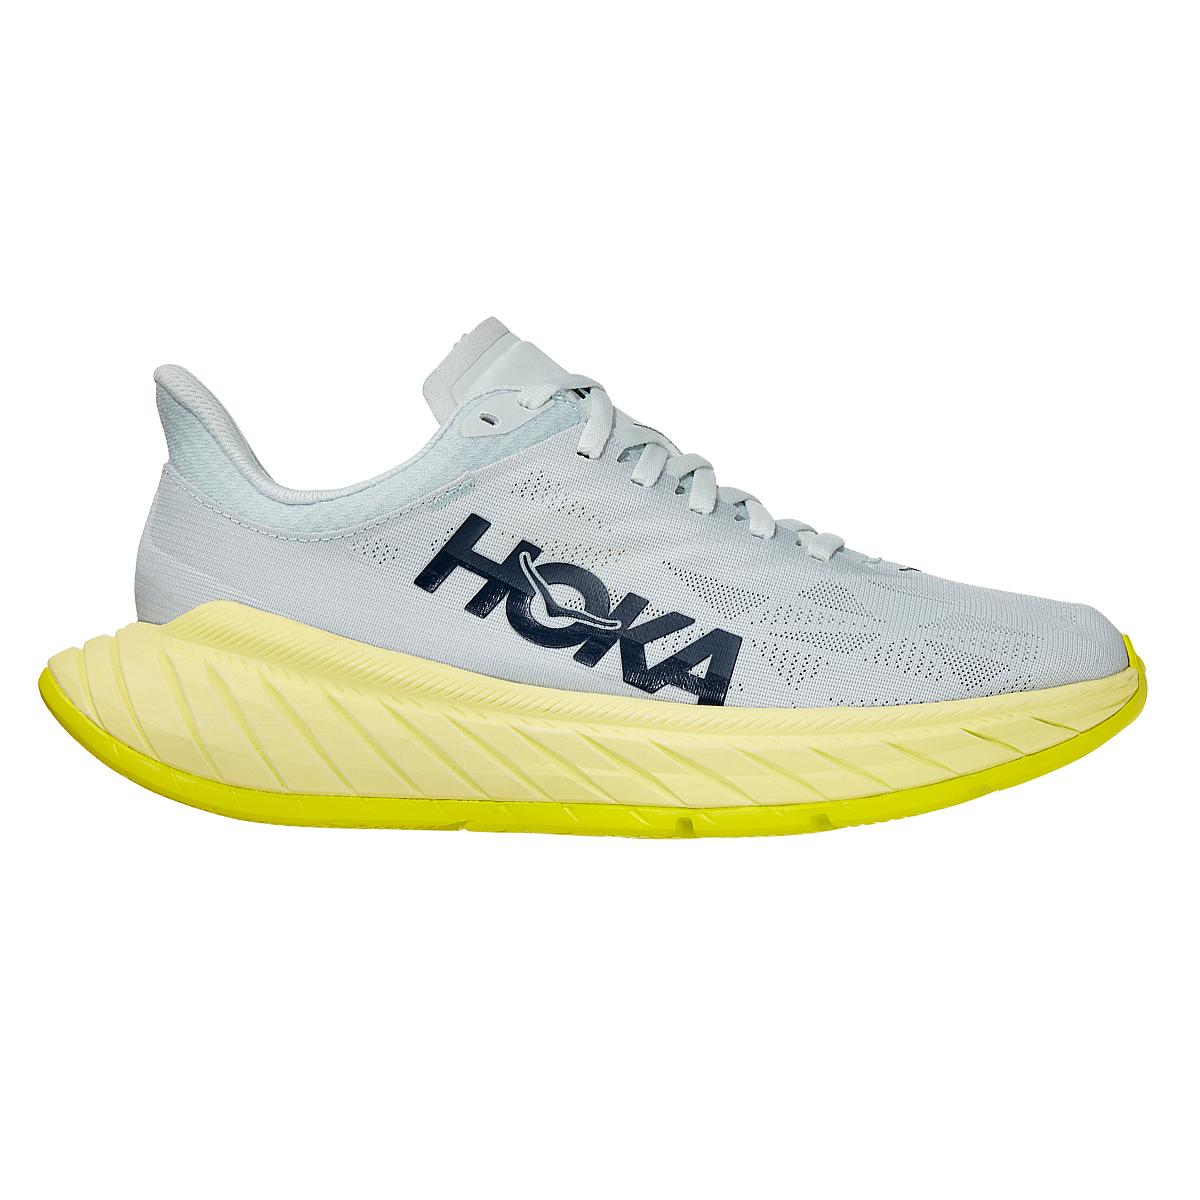 Women's Hoka One One Carbon X 2 Running Shoe - Color: Blue Flower/Luminary Green - Size: 5 - Width: Regular, Blue Flower/Luminary Green, large, image 1